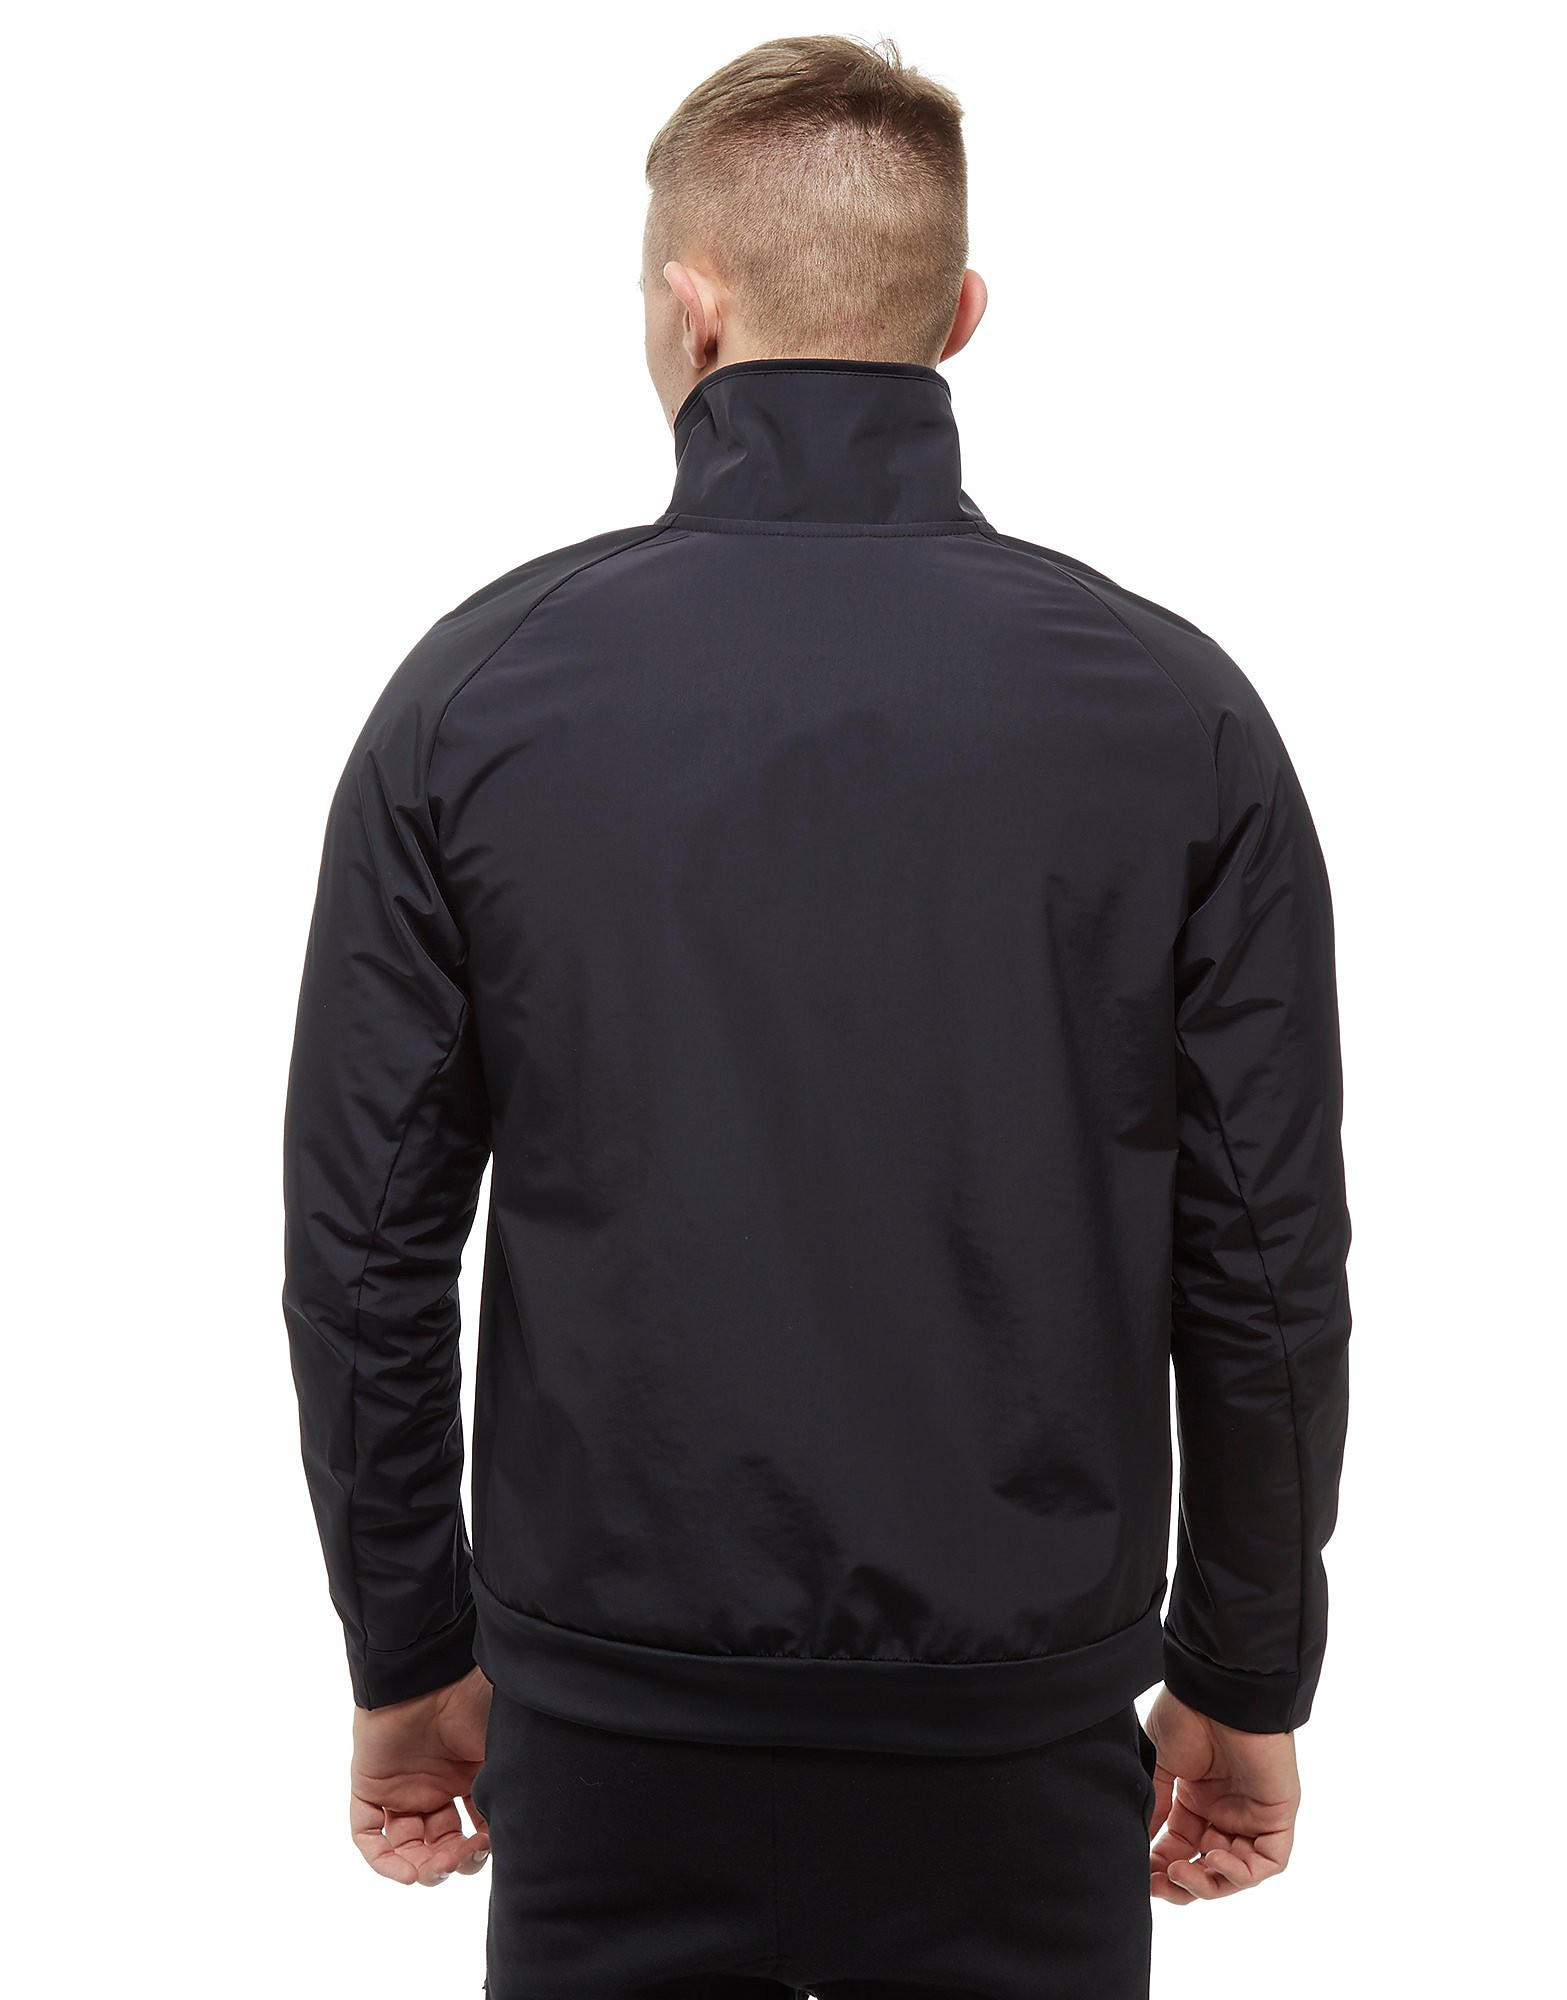 Nike Tech Woven Track Jacket